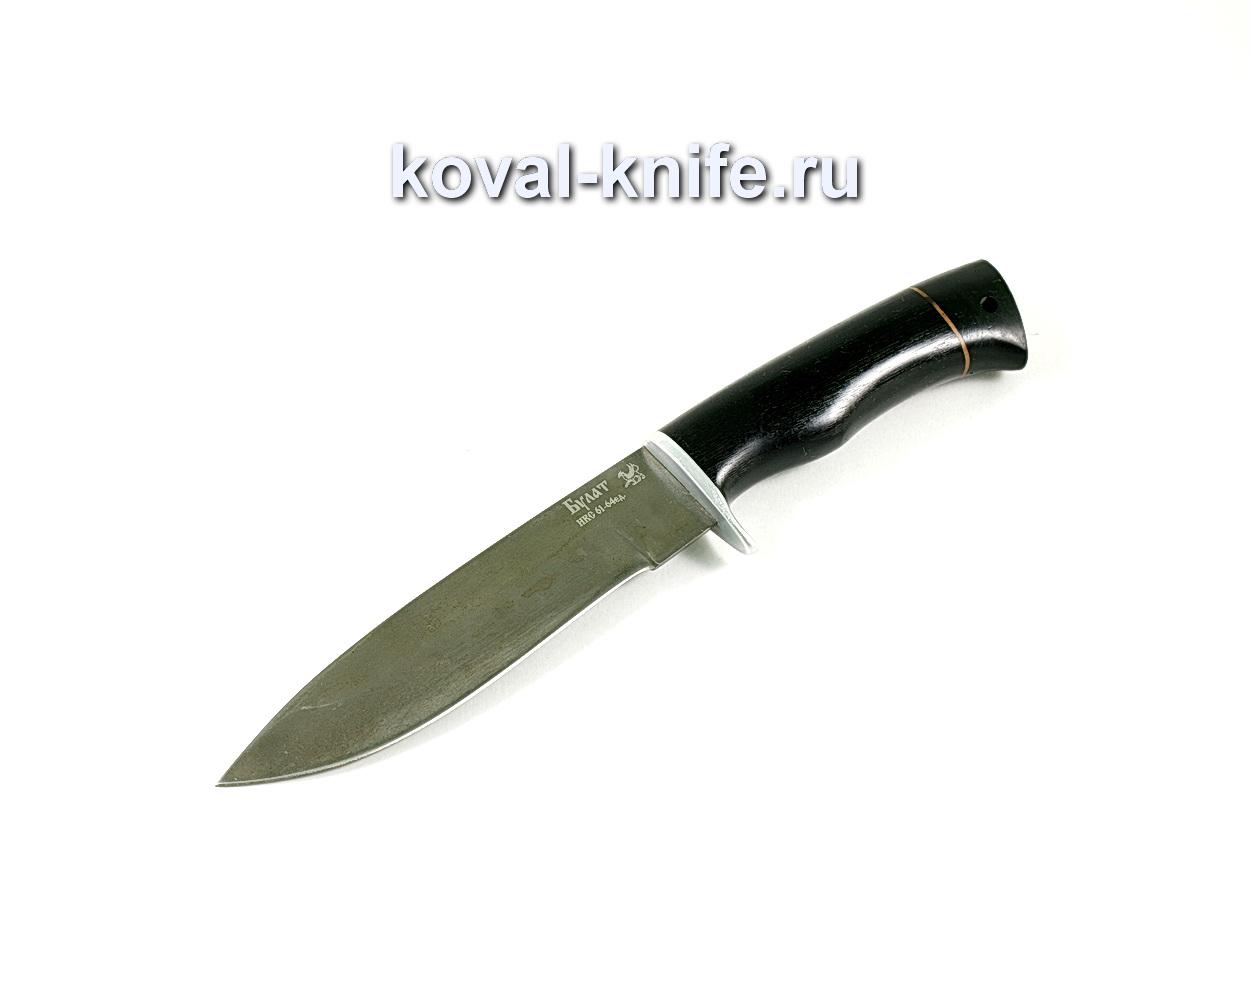 Нож Олимп (сталь Булат), рукоять граб A199